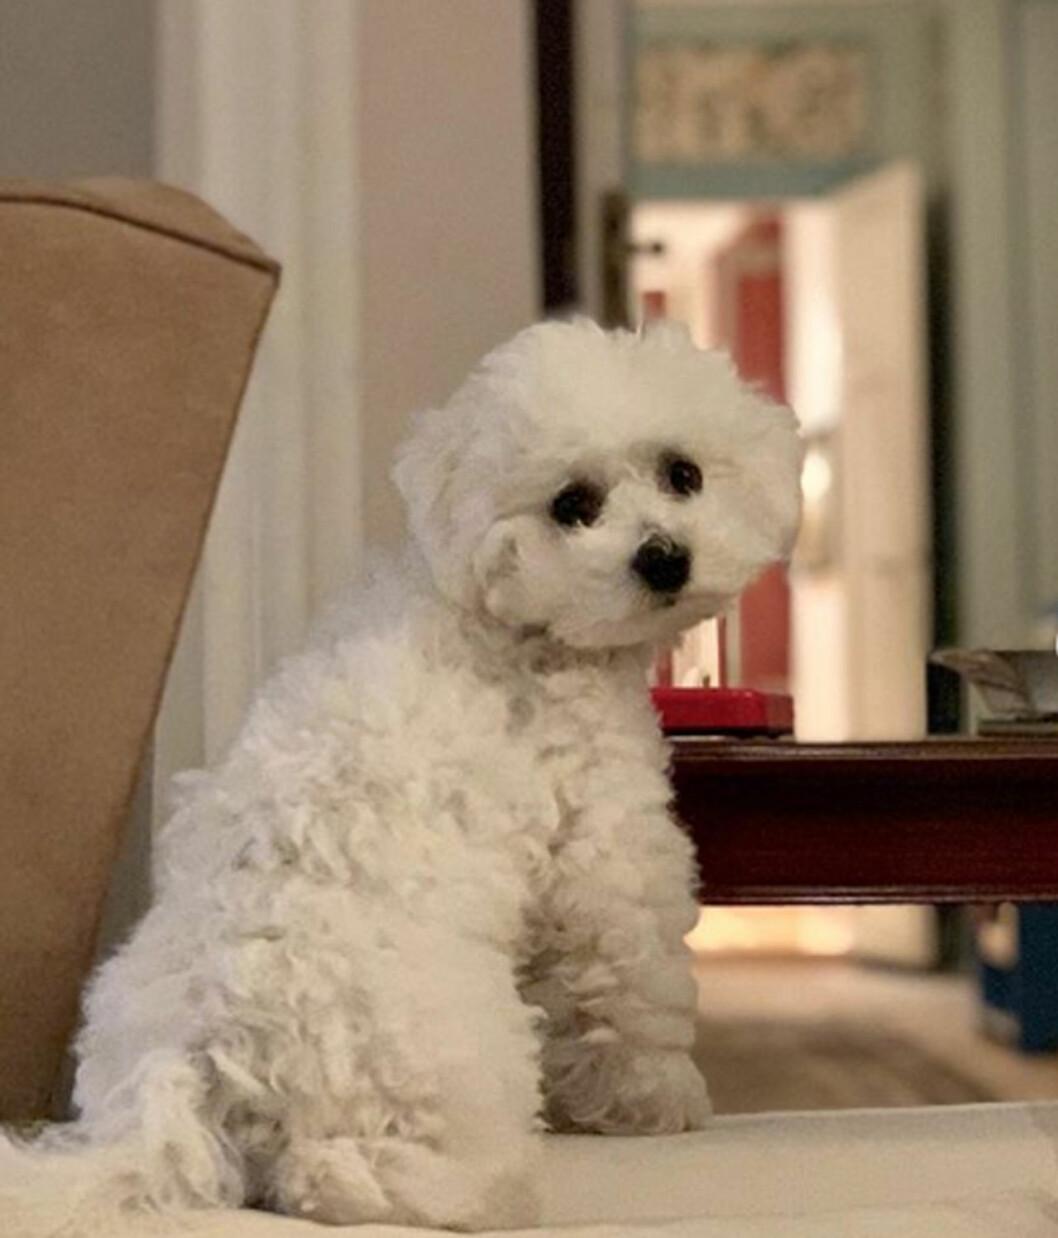 Prinsessan Maries och prins Joachims nya hundvalp Cerise.